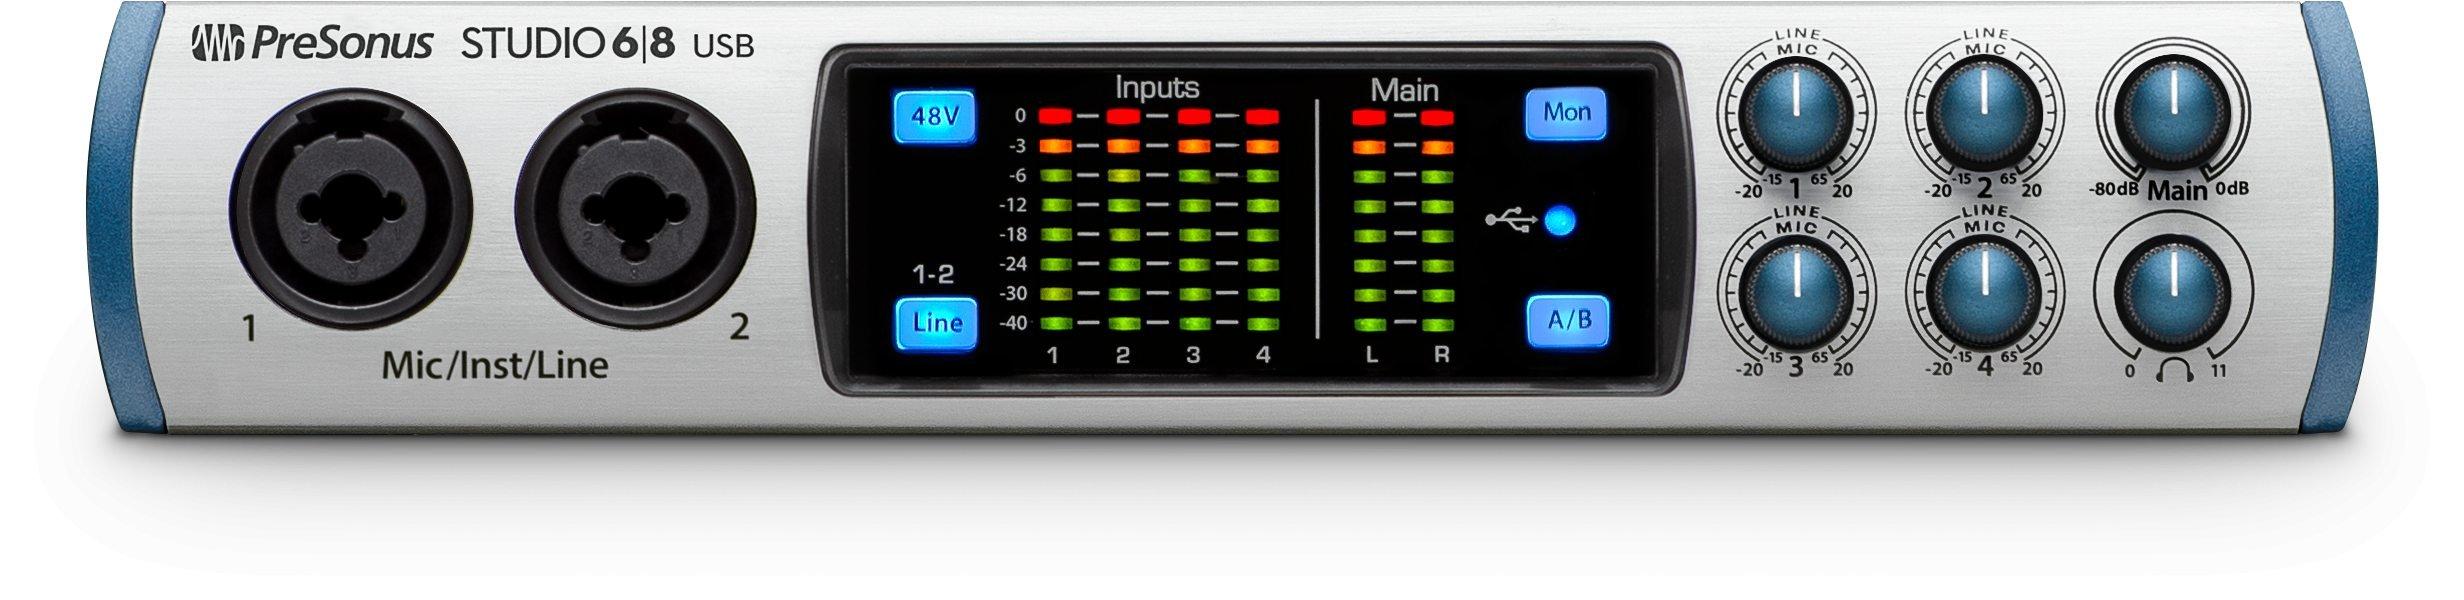 Presonus Studio 68 Audio Interface with AKG K240 Studio Headphones by PreSonus (Image #2)